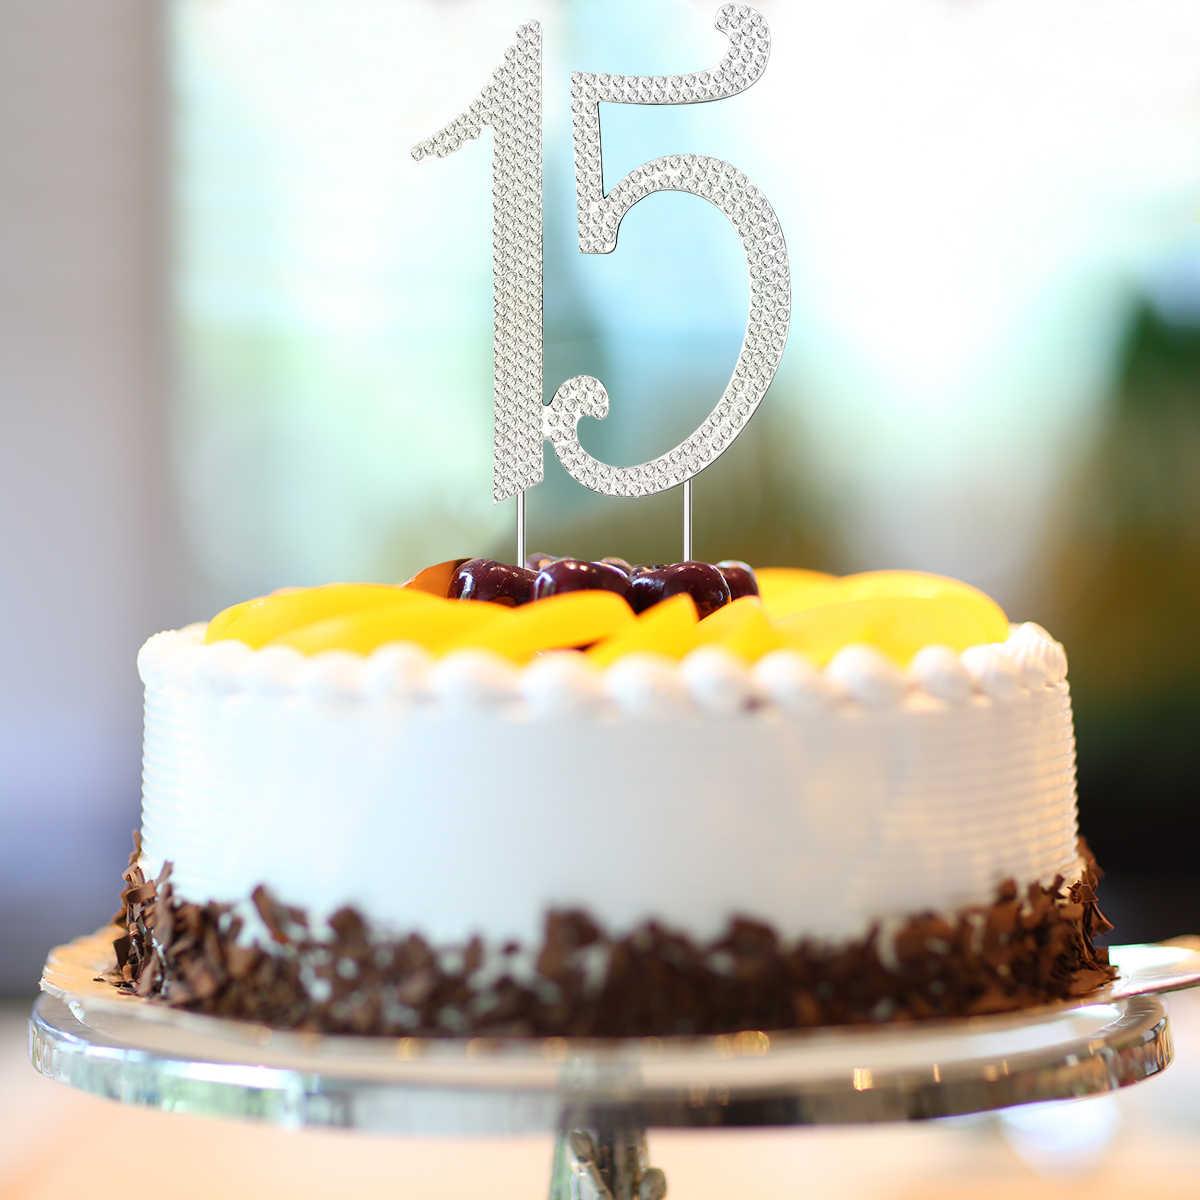 Fantastic 15 Cake Topper For 15Th Birthday Party Or Anniversary Crystal Funny Birthday Cards Online Elaedamsfinfo